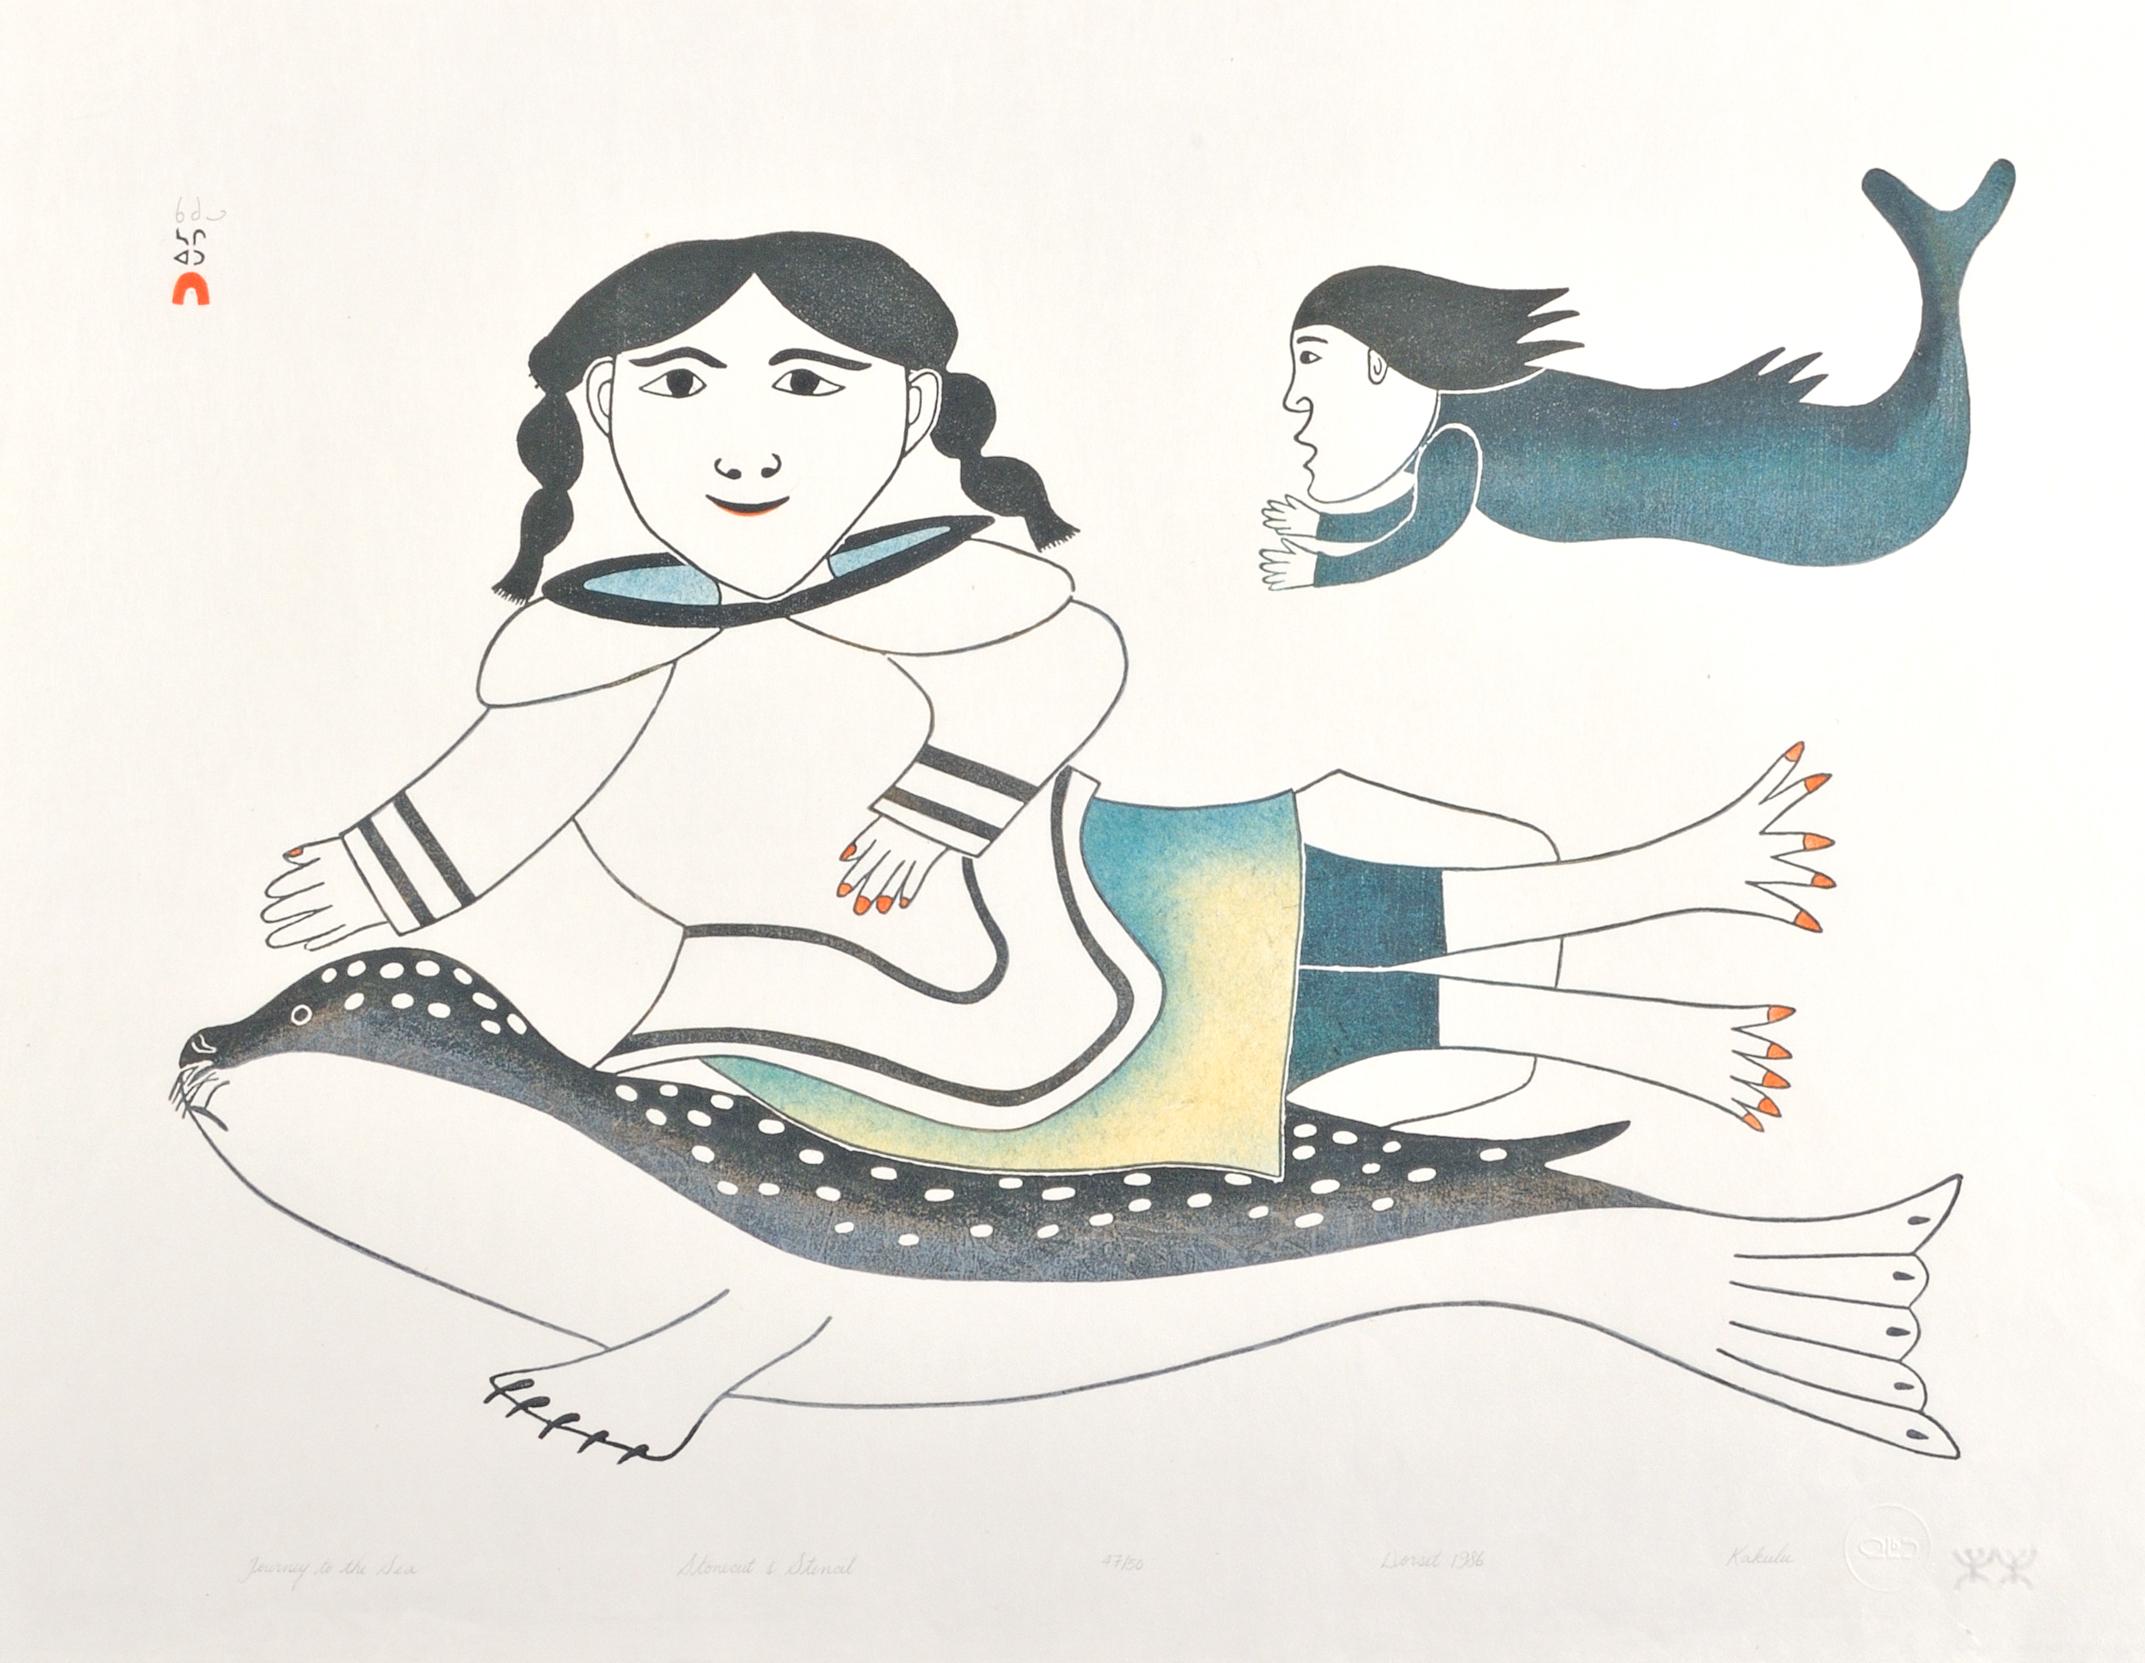 Kakulu Saggiaktok  JOURNEY TO THE SEA Stonecut & Stencil 1986 54.7 x 71 cm $350.00 CDN Released in the 1986 collection Dorset ID#: 86-04